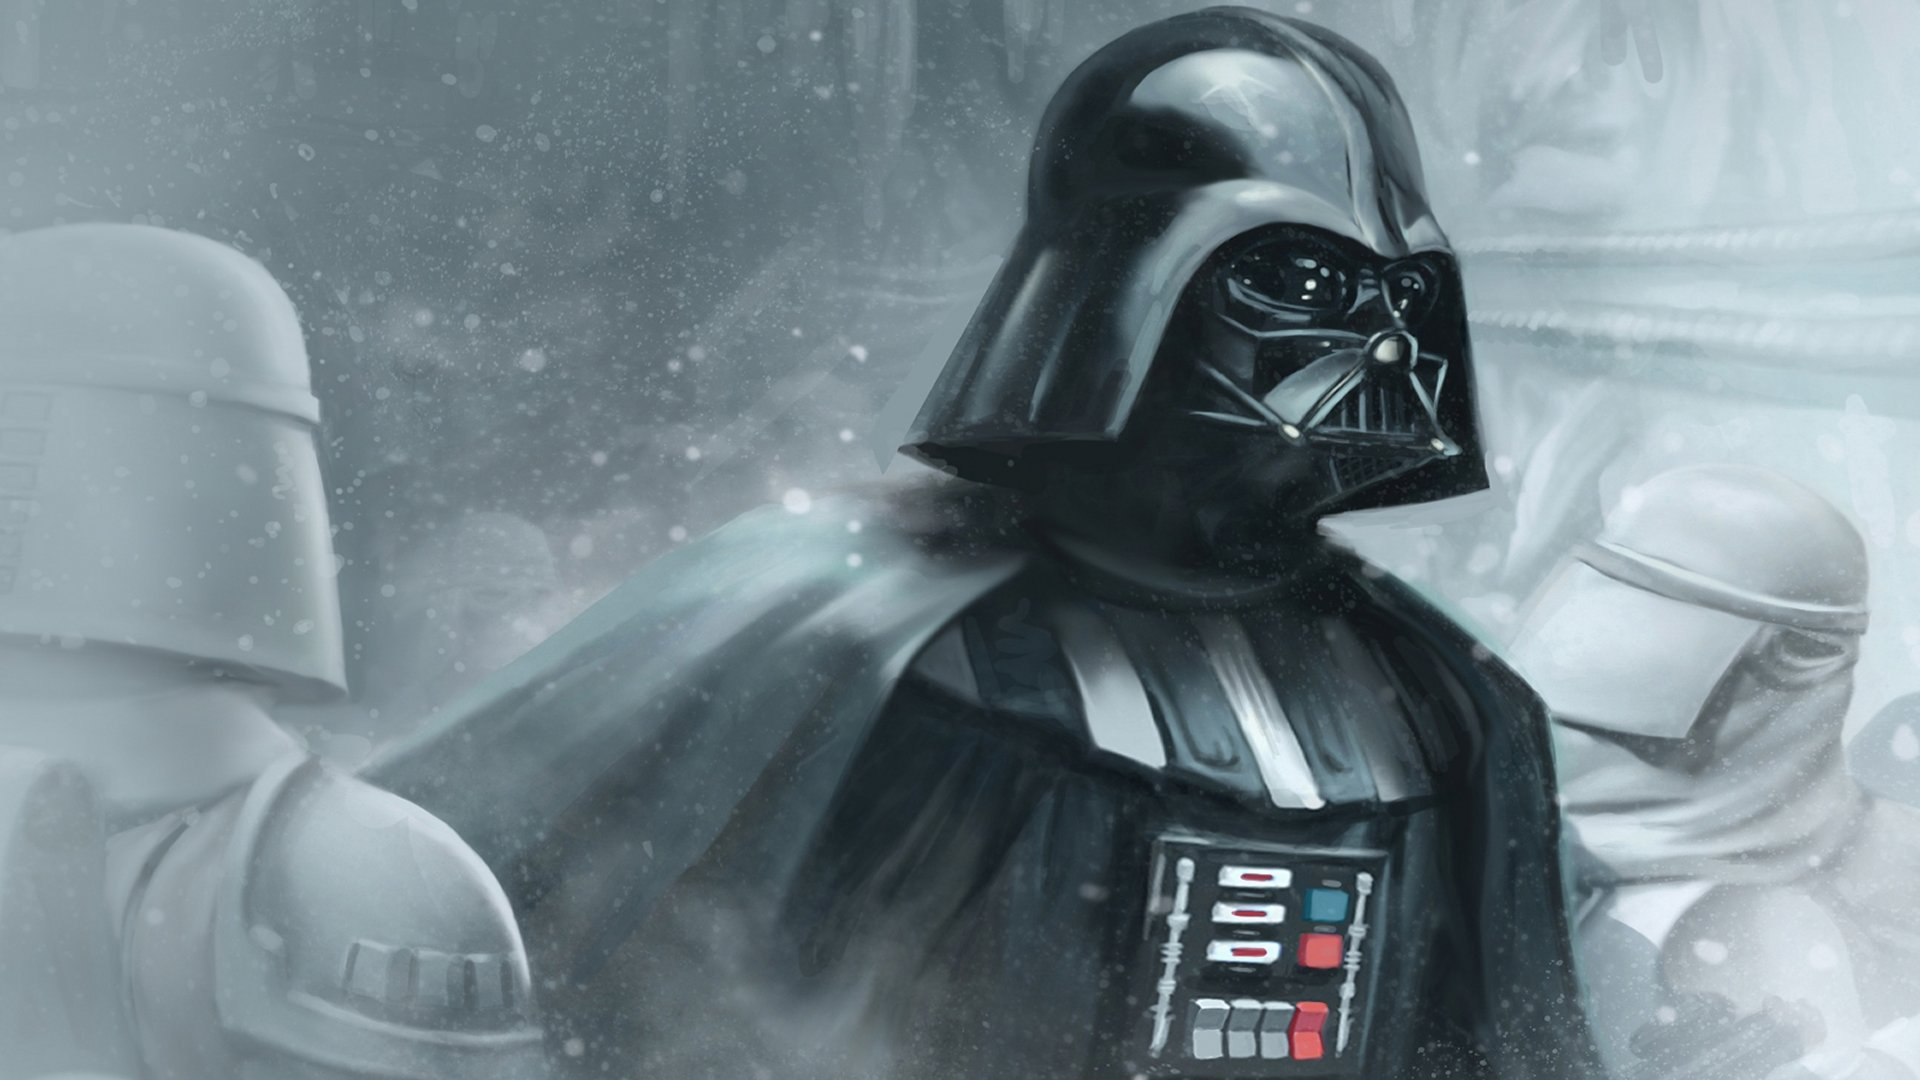 High Resolution Star Wars Full Hd 1080p Wallpaper Id Star Wars Wallpaper Full Hd 1920x1080 Wallpaper Teahub Io